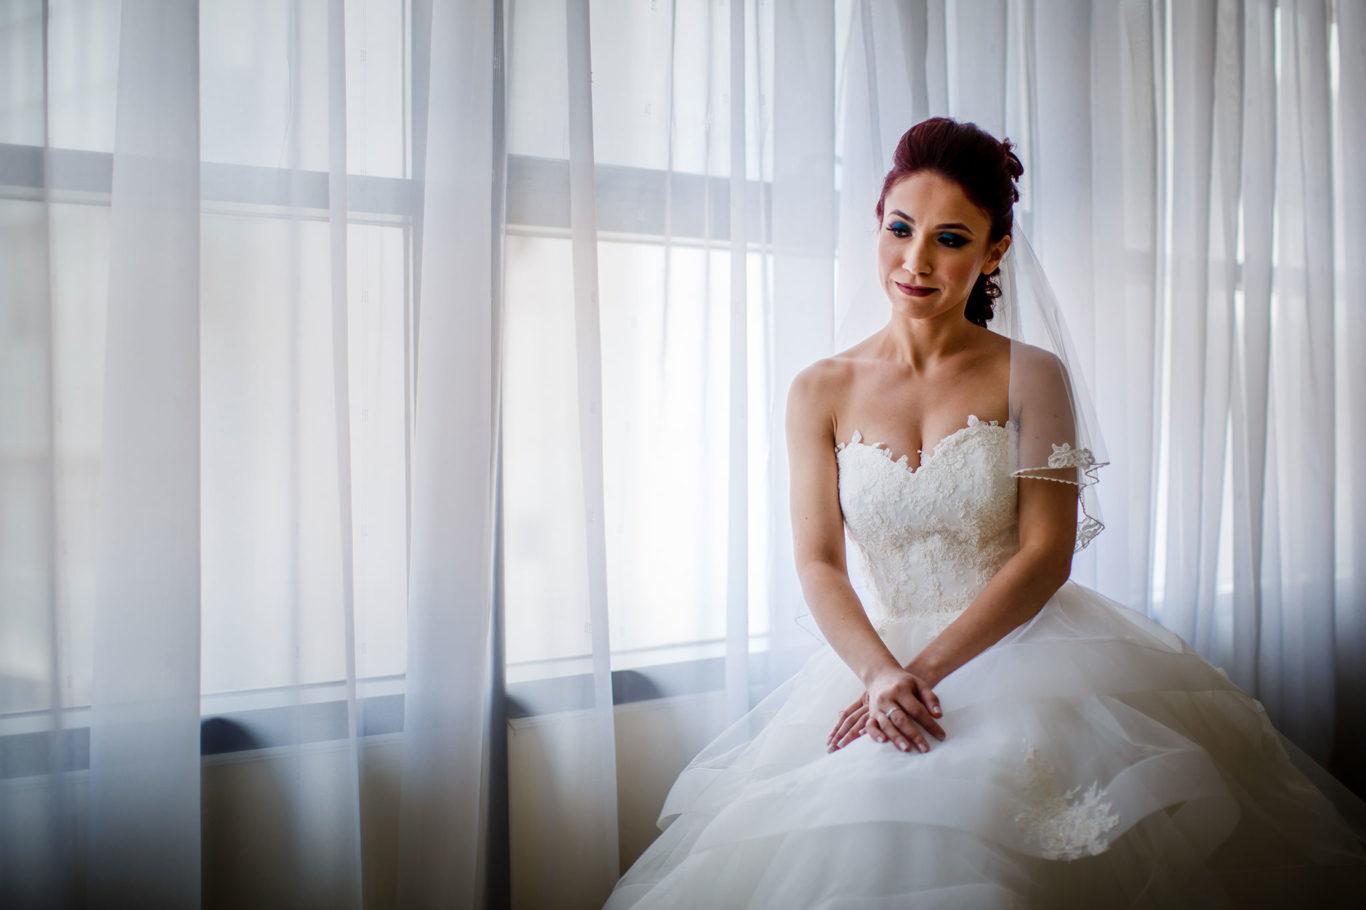 0079-fotografie-nunta-bucuresti-cristina-nicusor-fotograf-ciprian-dumitrescu-cd2_0824